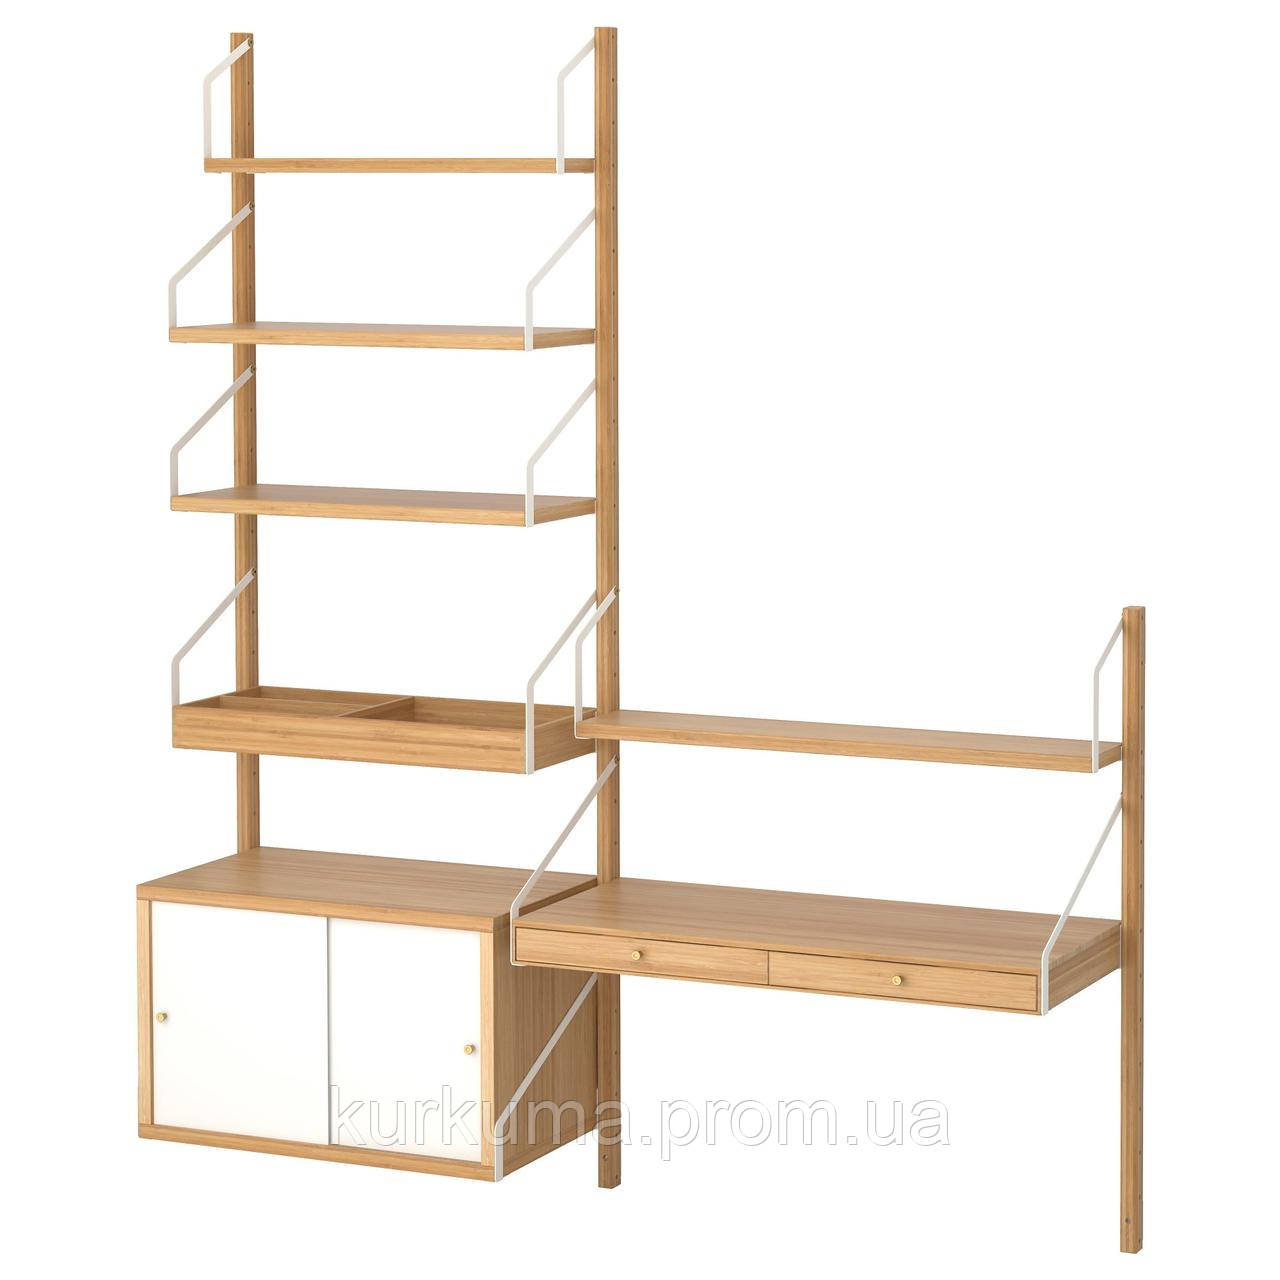 IKEA SVALNAS Настенный стеллаж, бамбук, белый  (691.844.50)